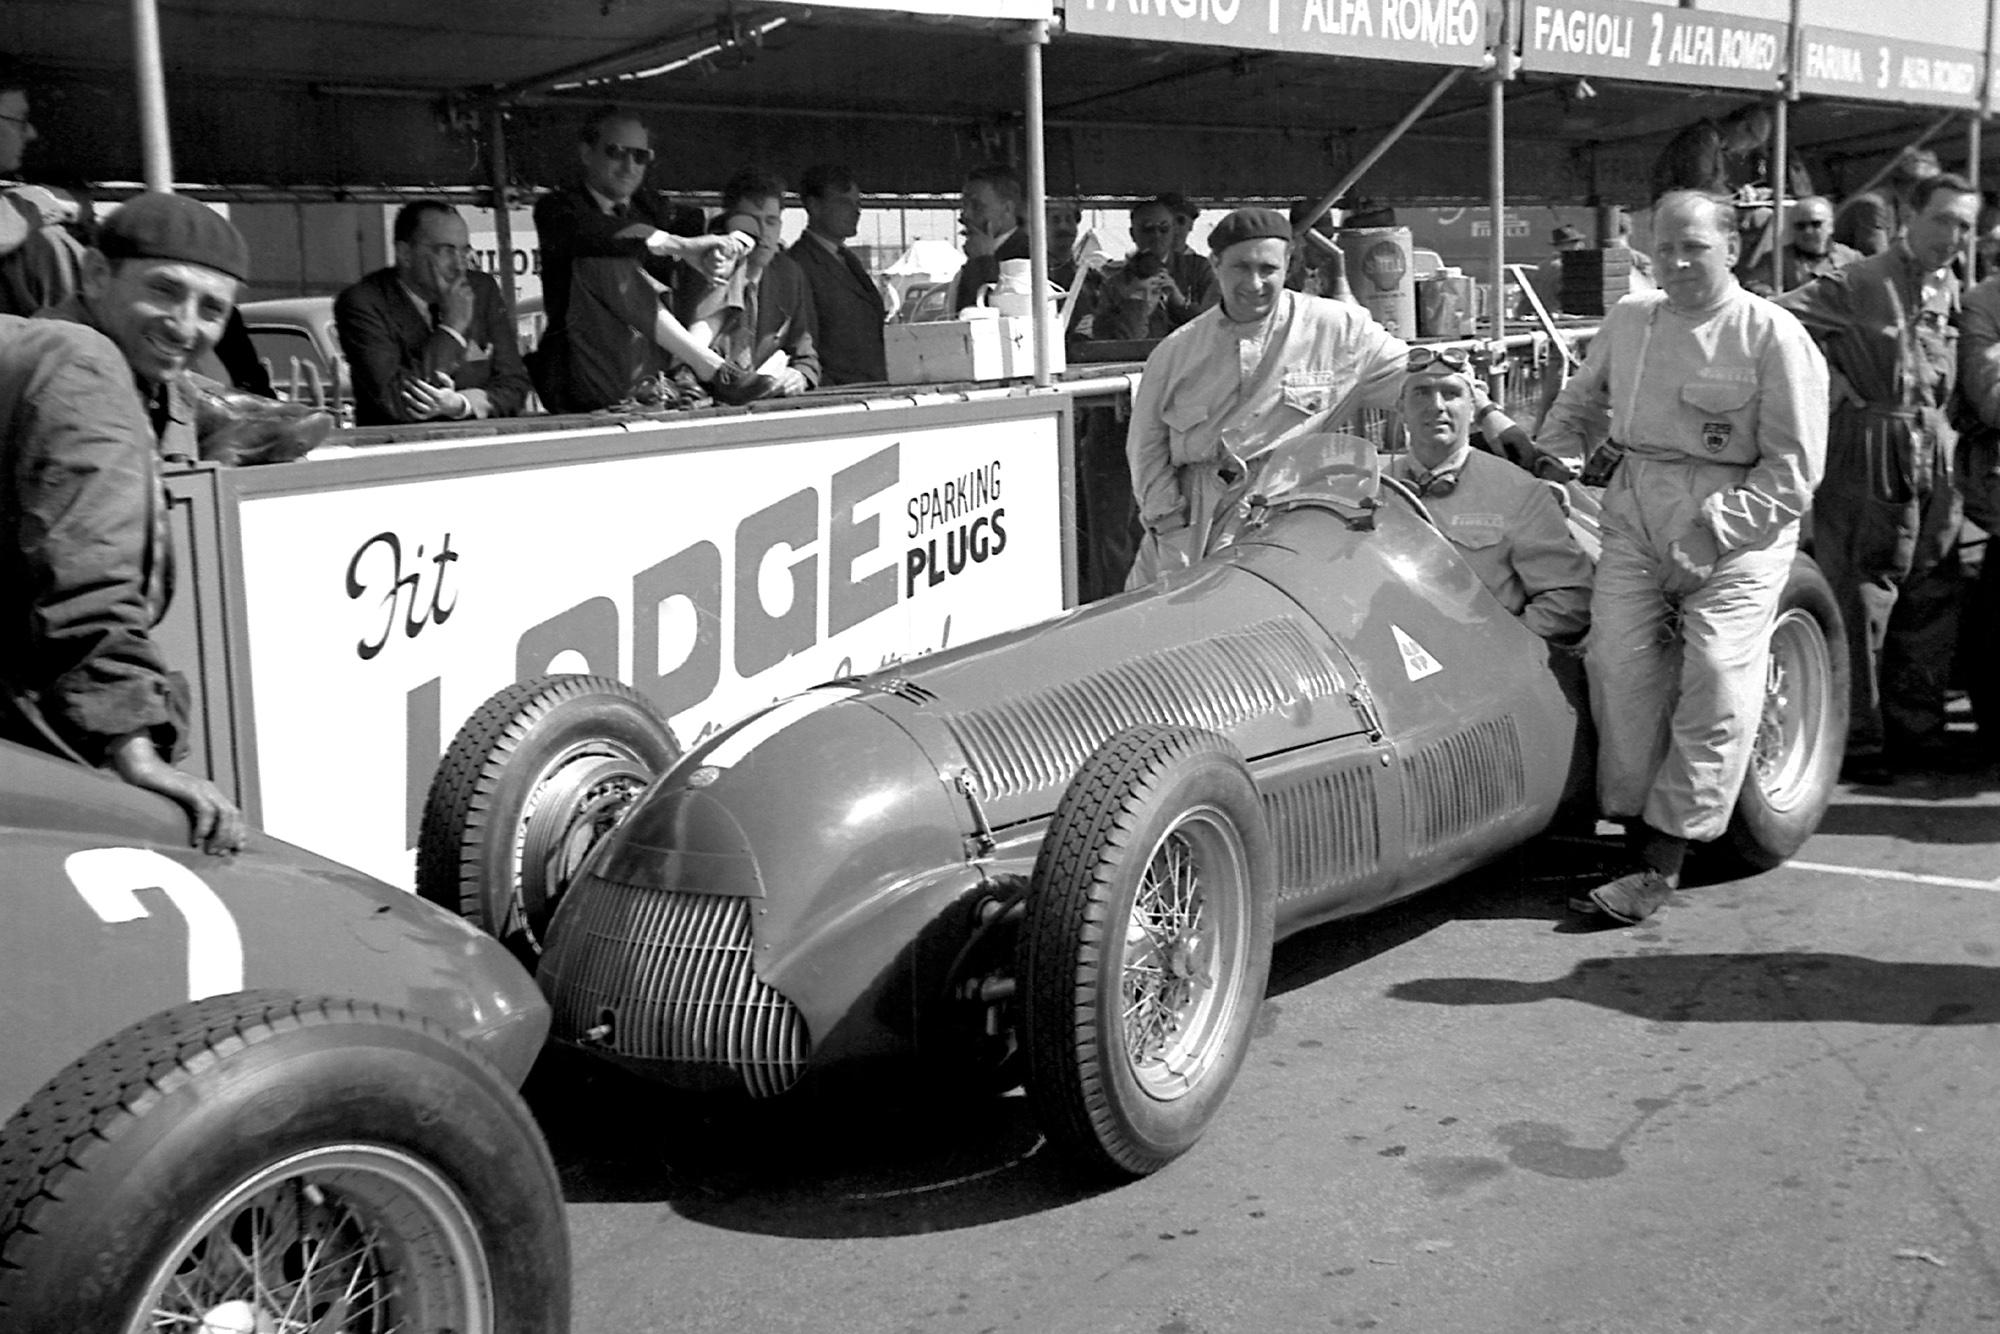 Juan Manuel Fangio Giuseppe Farina and Reg Parnell at the 1950 British Grand Prix at Silverstone